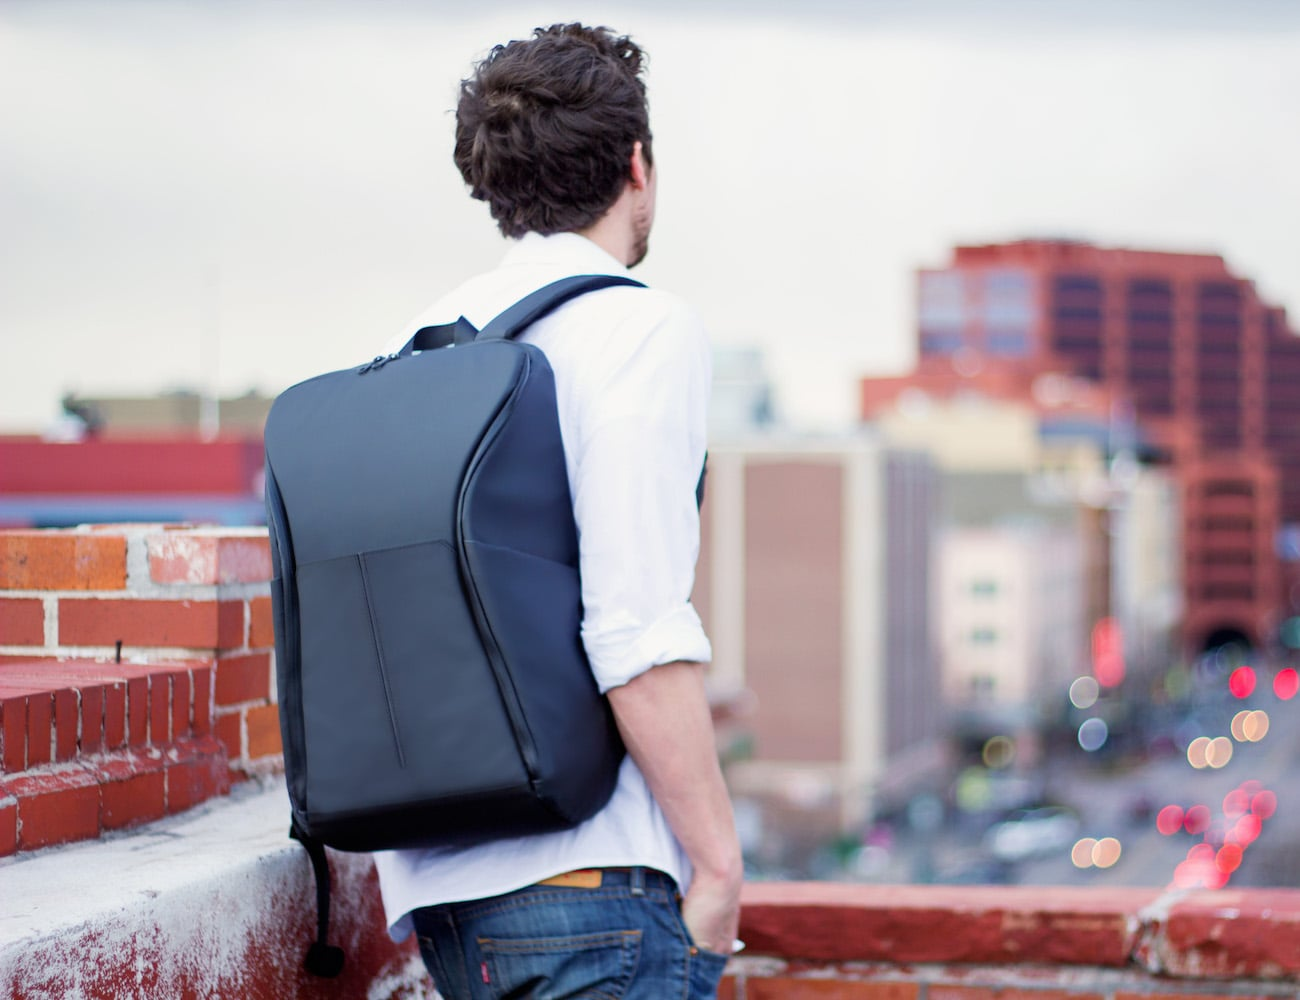 Sopin+Backpack+%26%238211%3B+The+Urban+Navigator